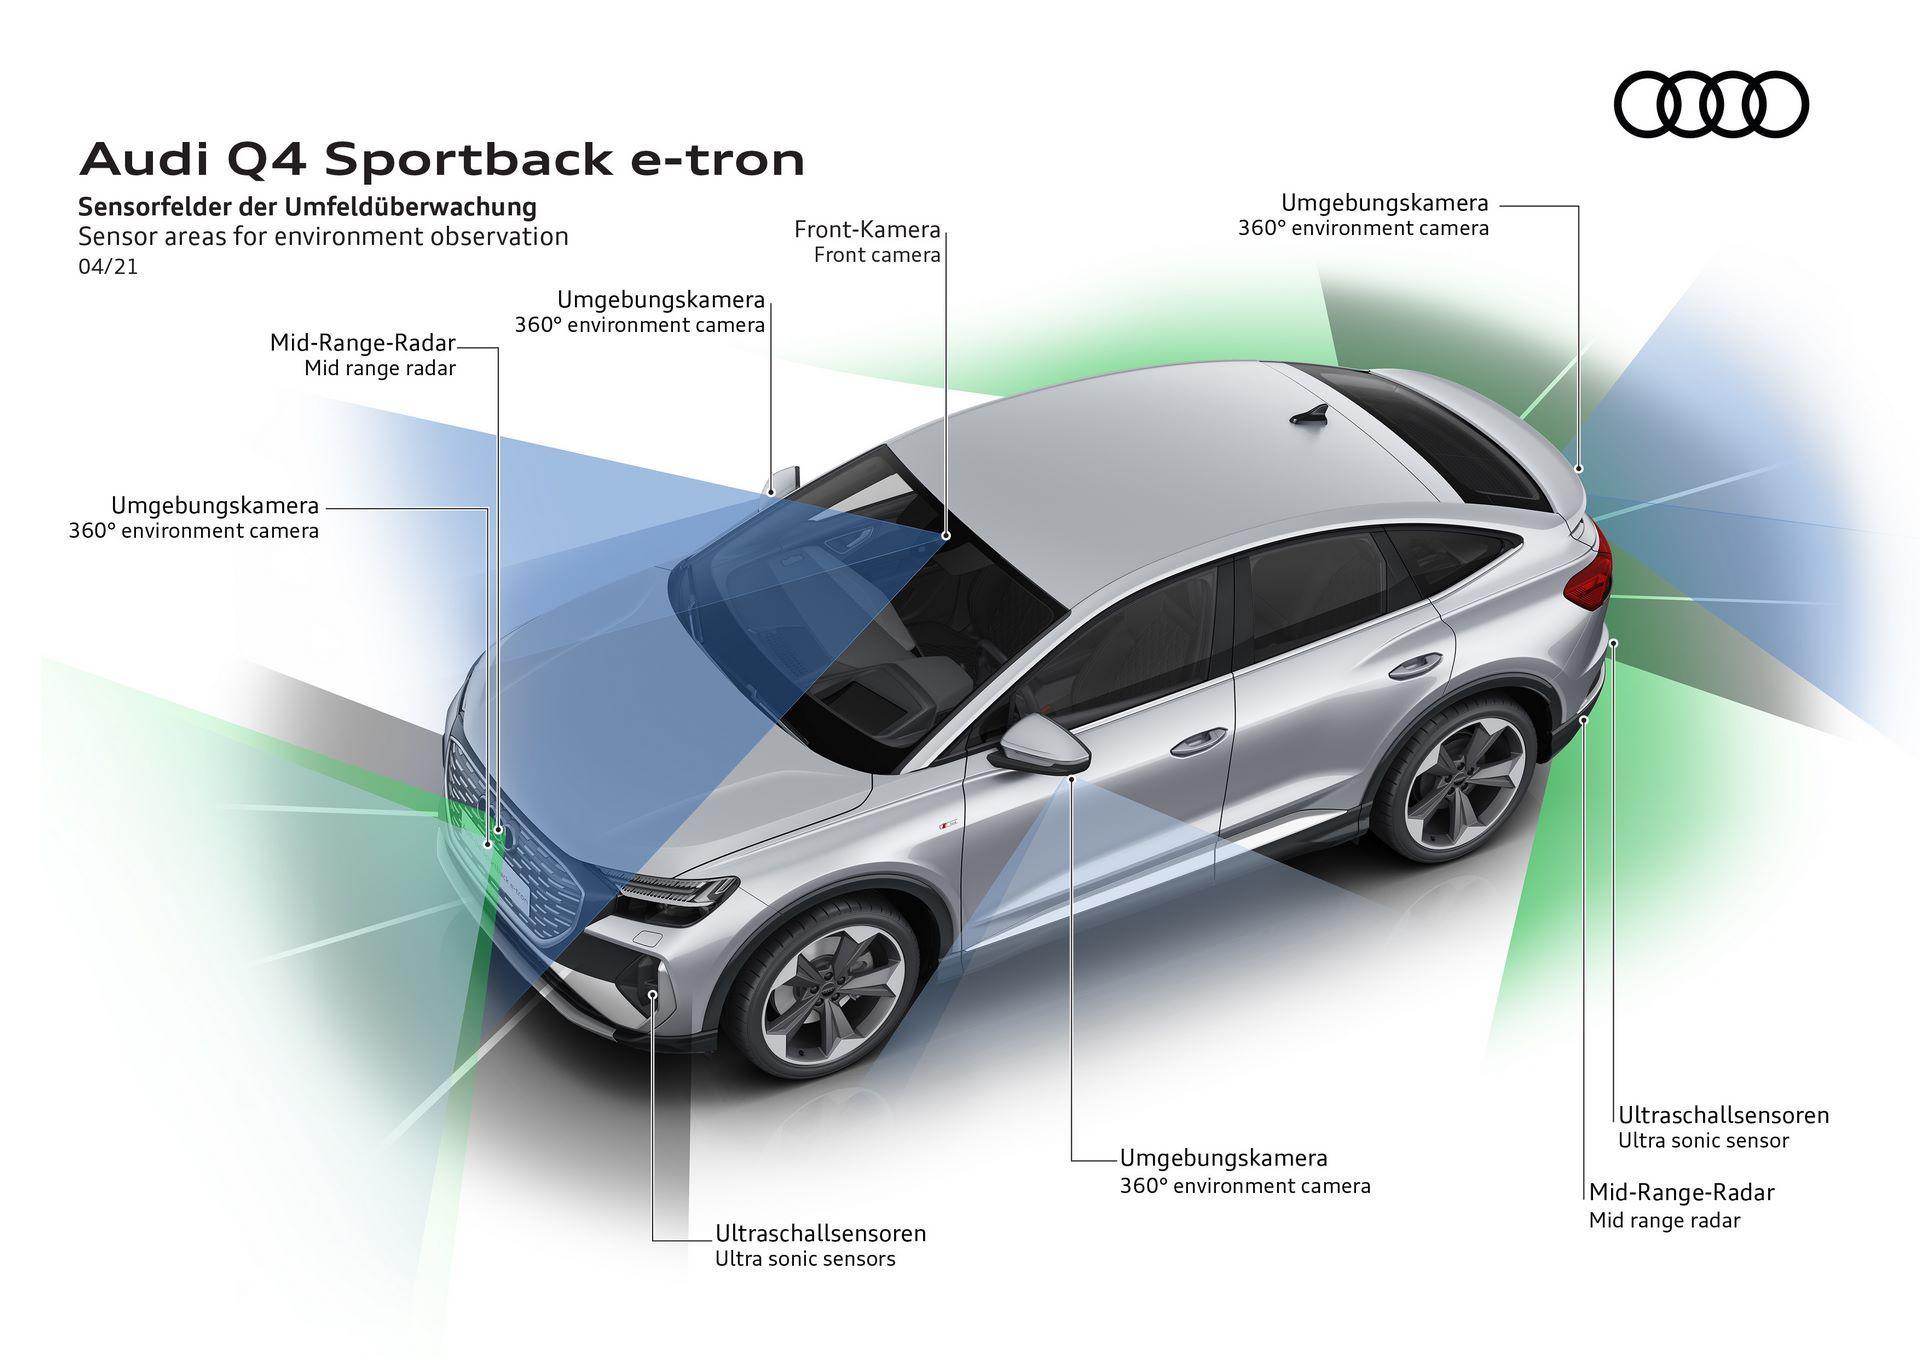 Audi-Q4-e-tron-and-Q4-e-tron-Sportback-138